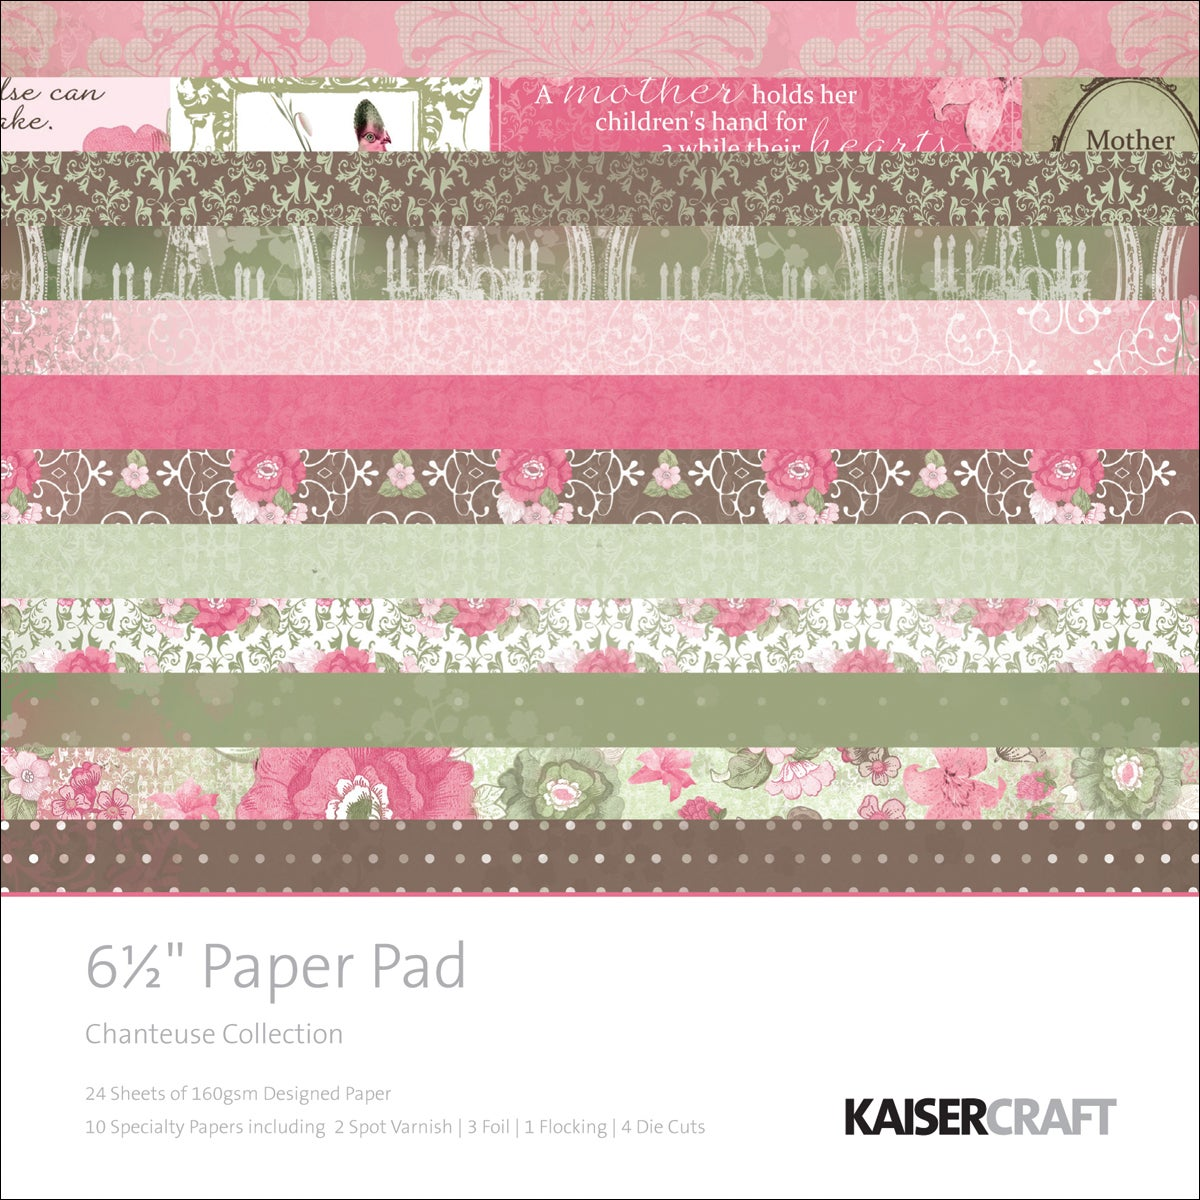 Chanteuse Paper Pad Sheets